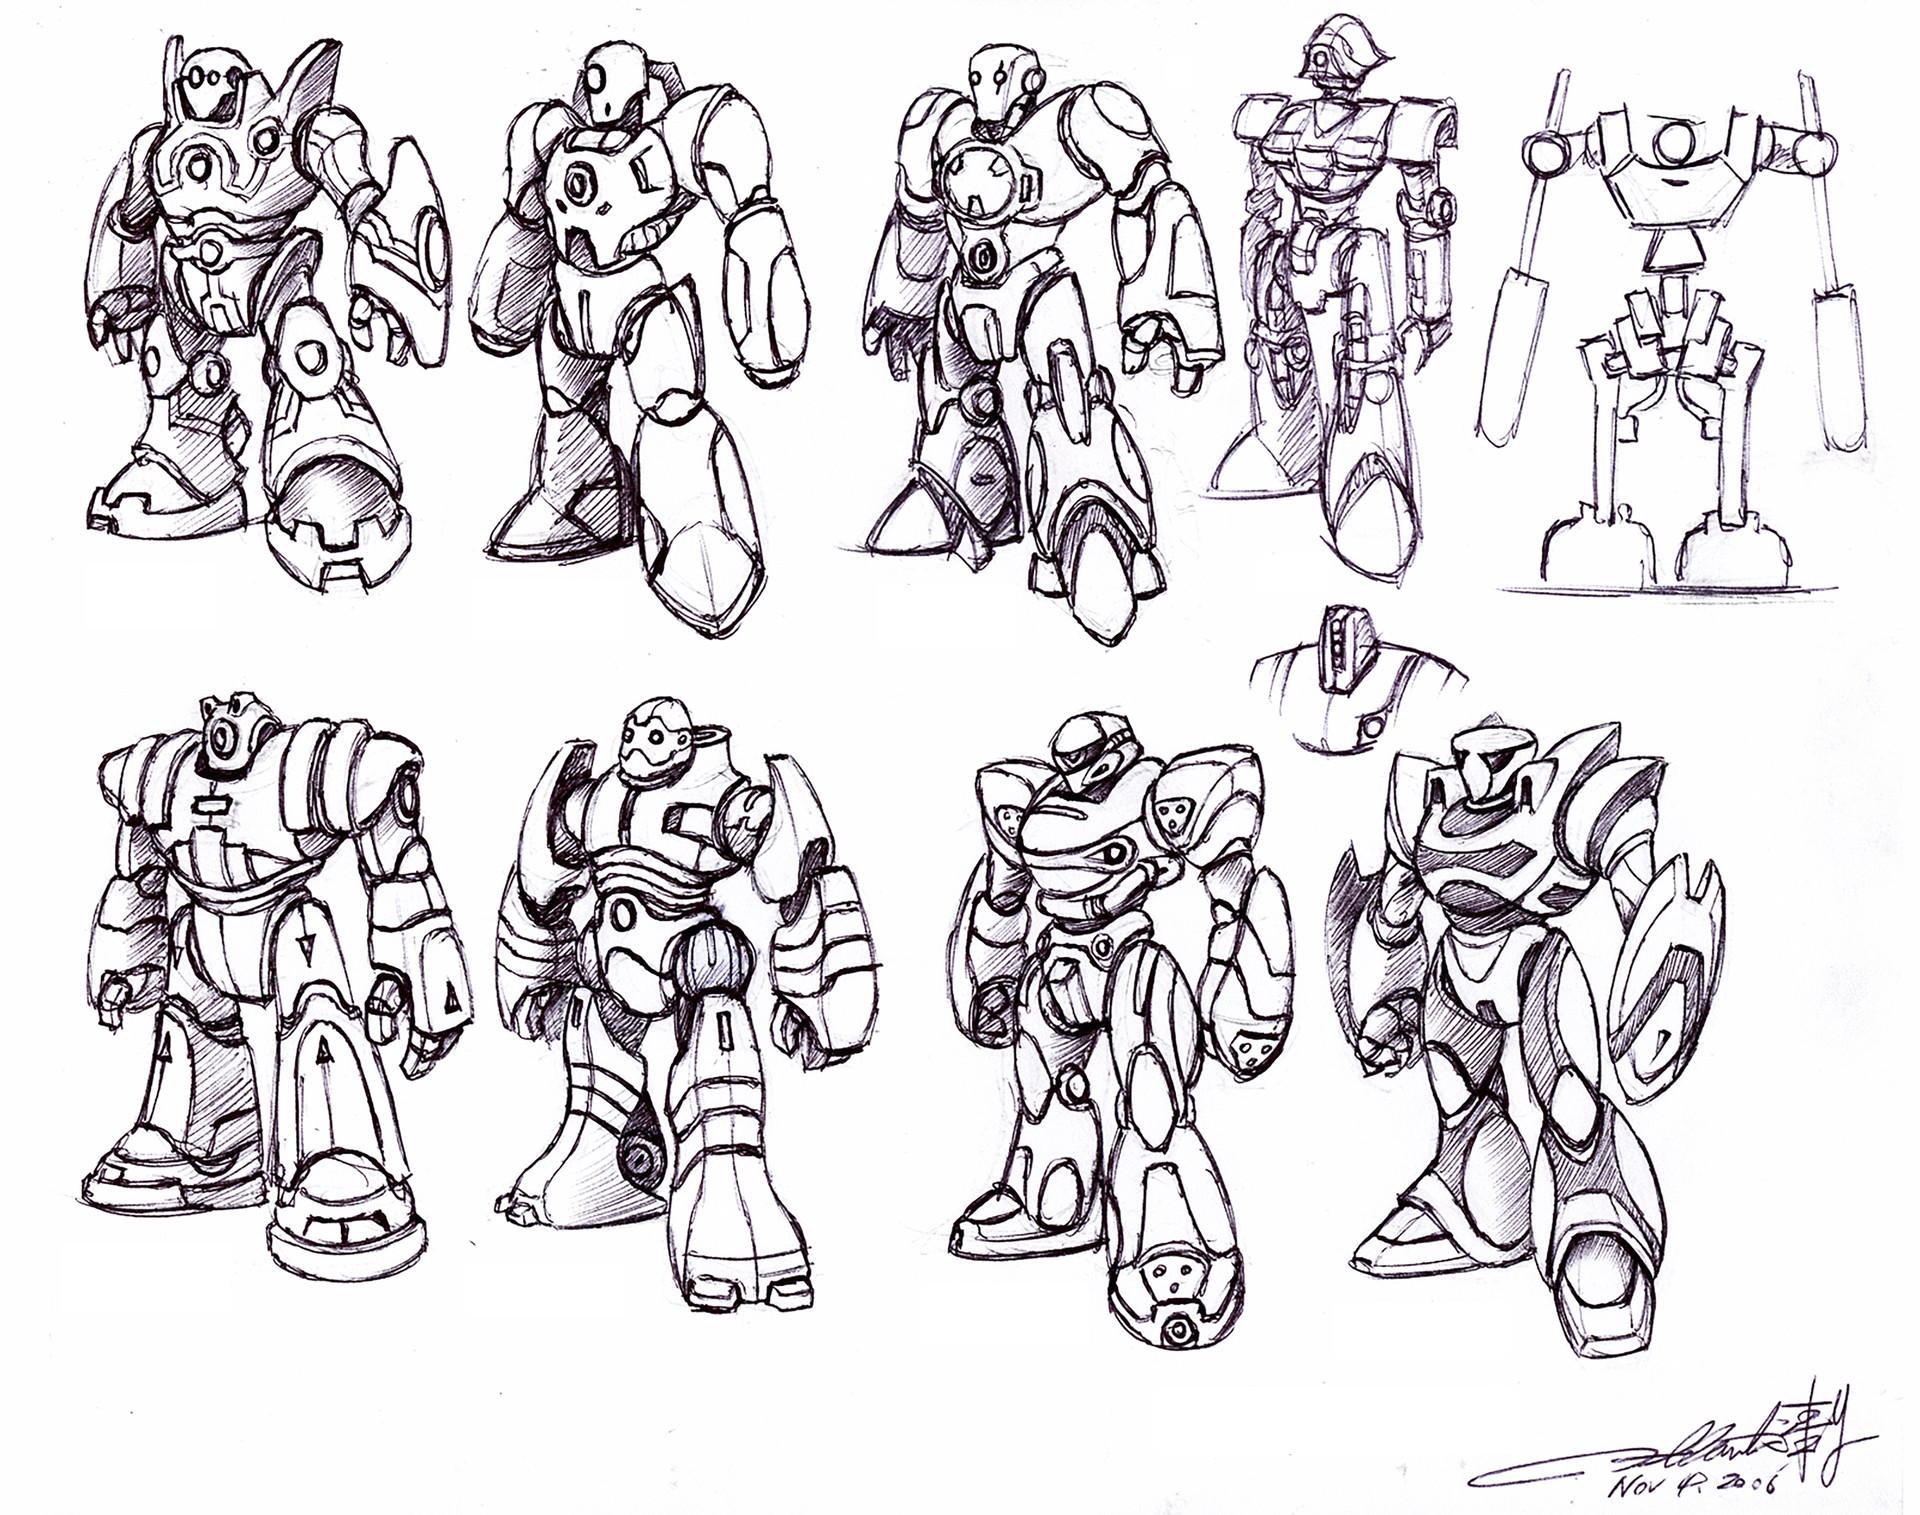 Humanoid Robotic Toy Concept I